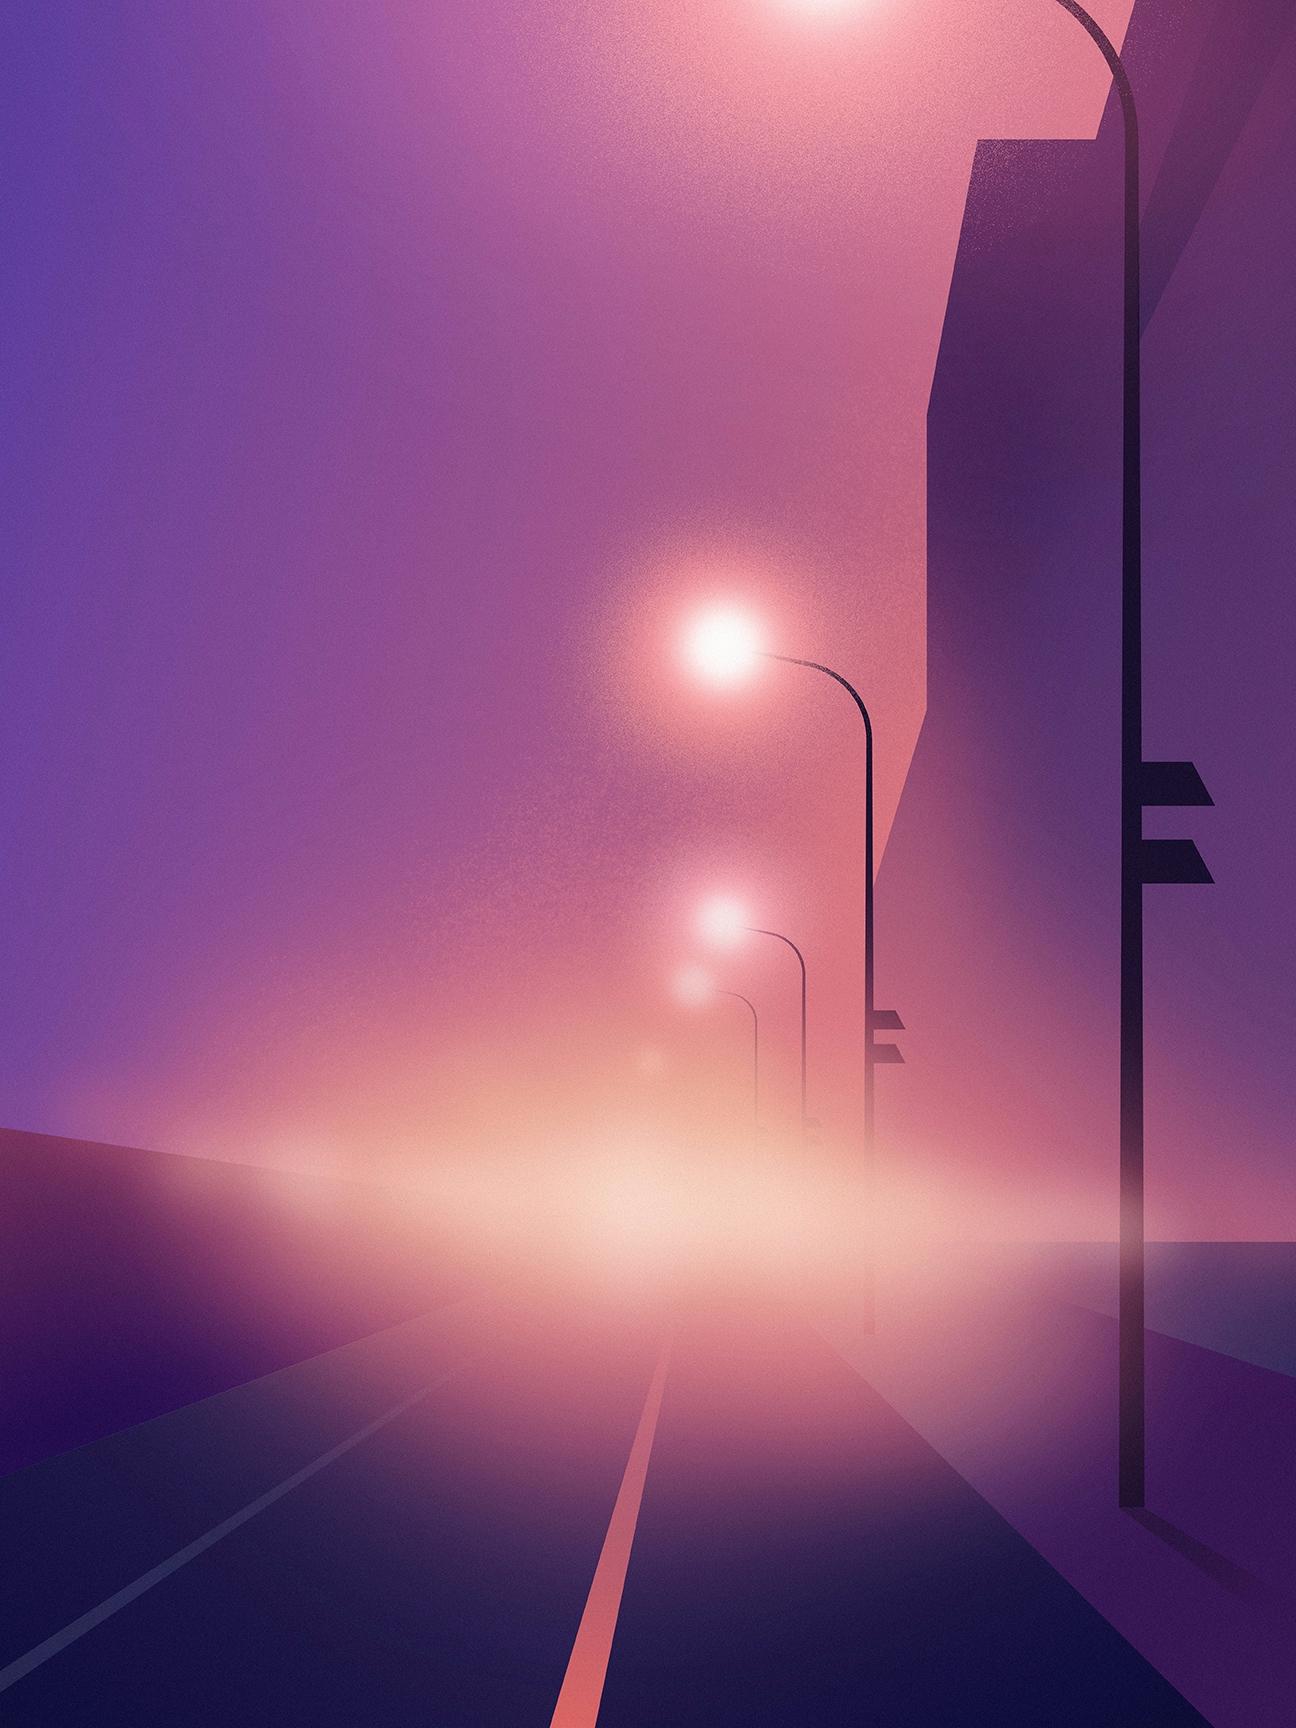 Street lights - neon, neonlights - filianstudio | ello